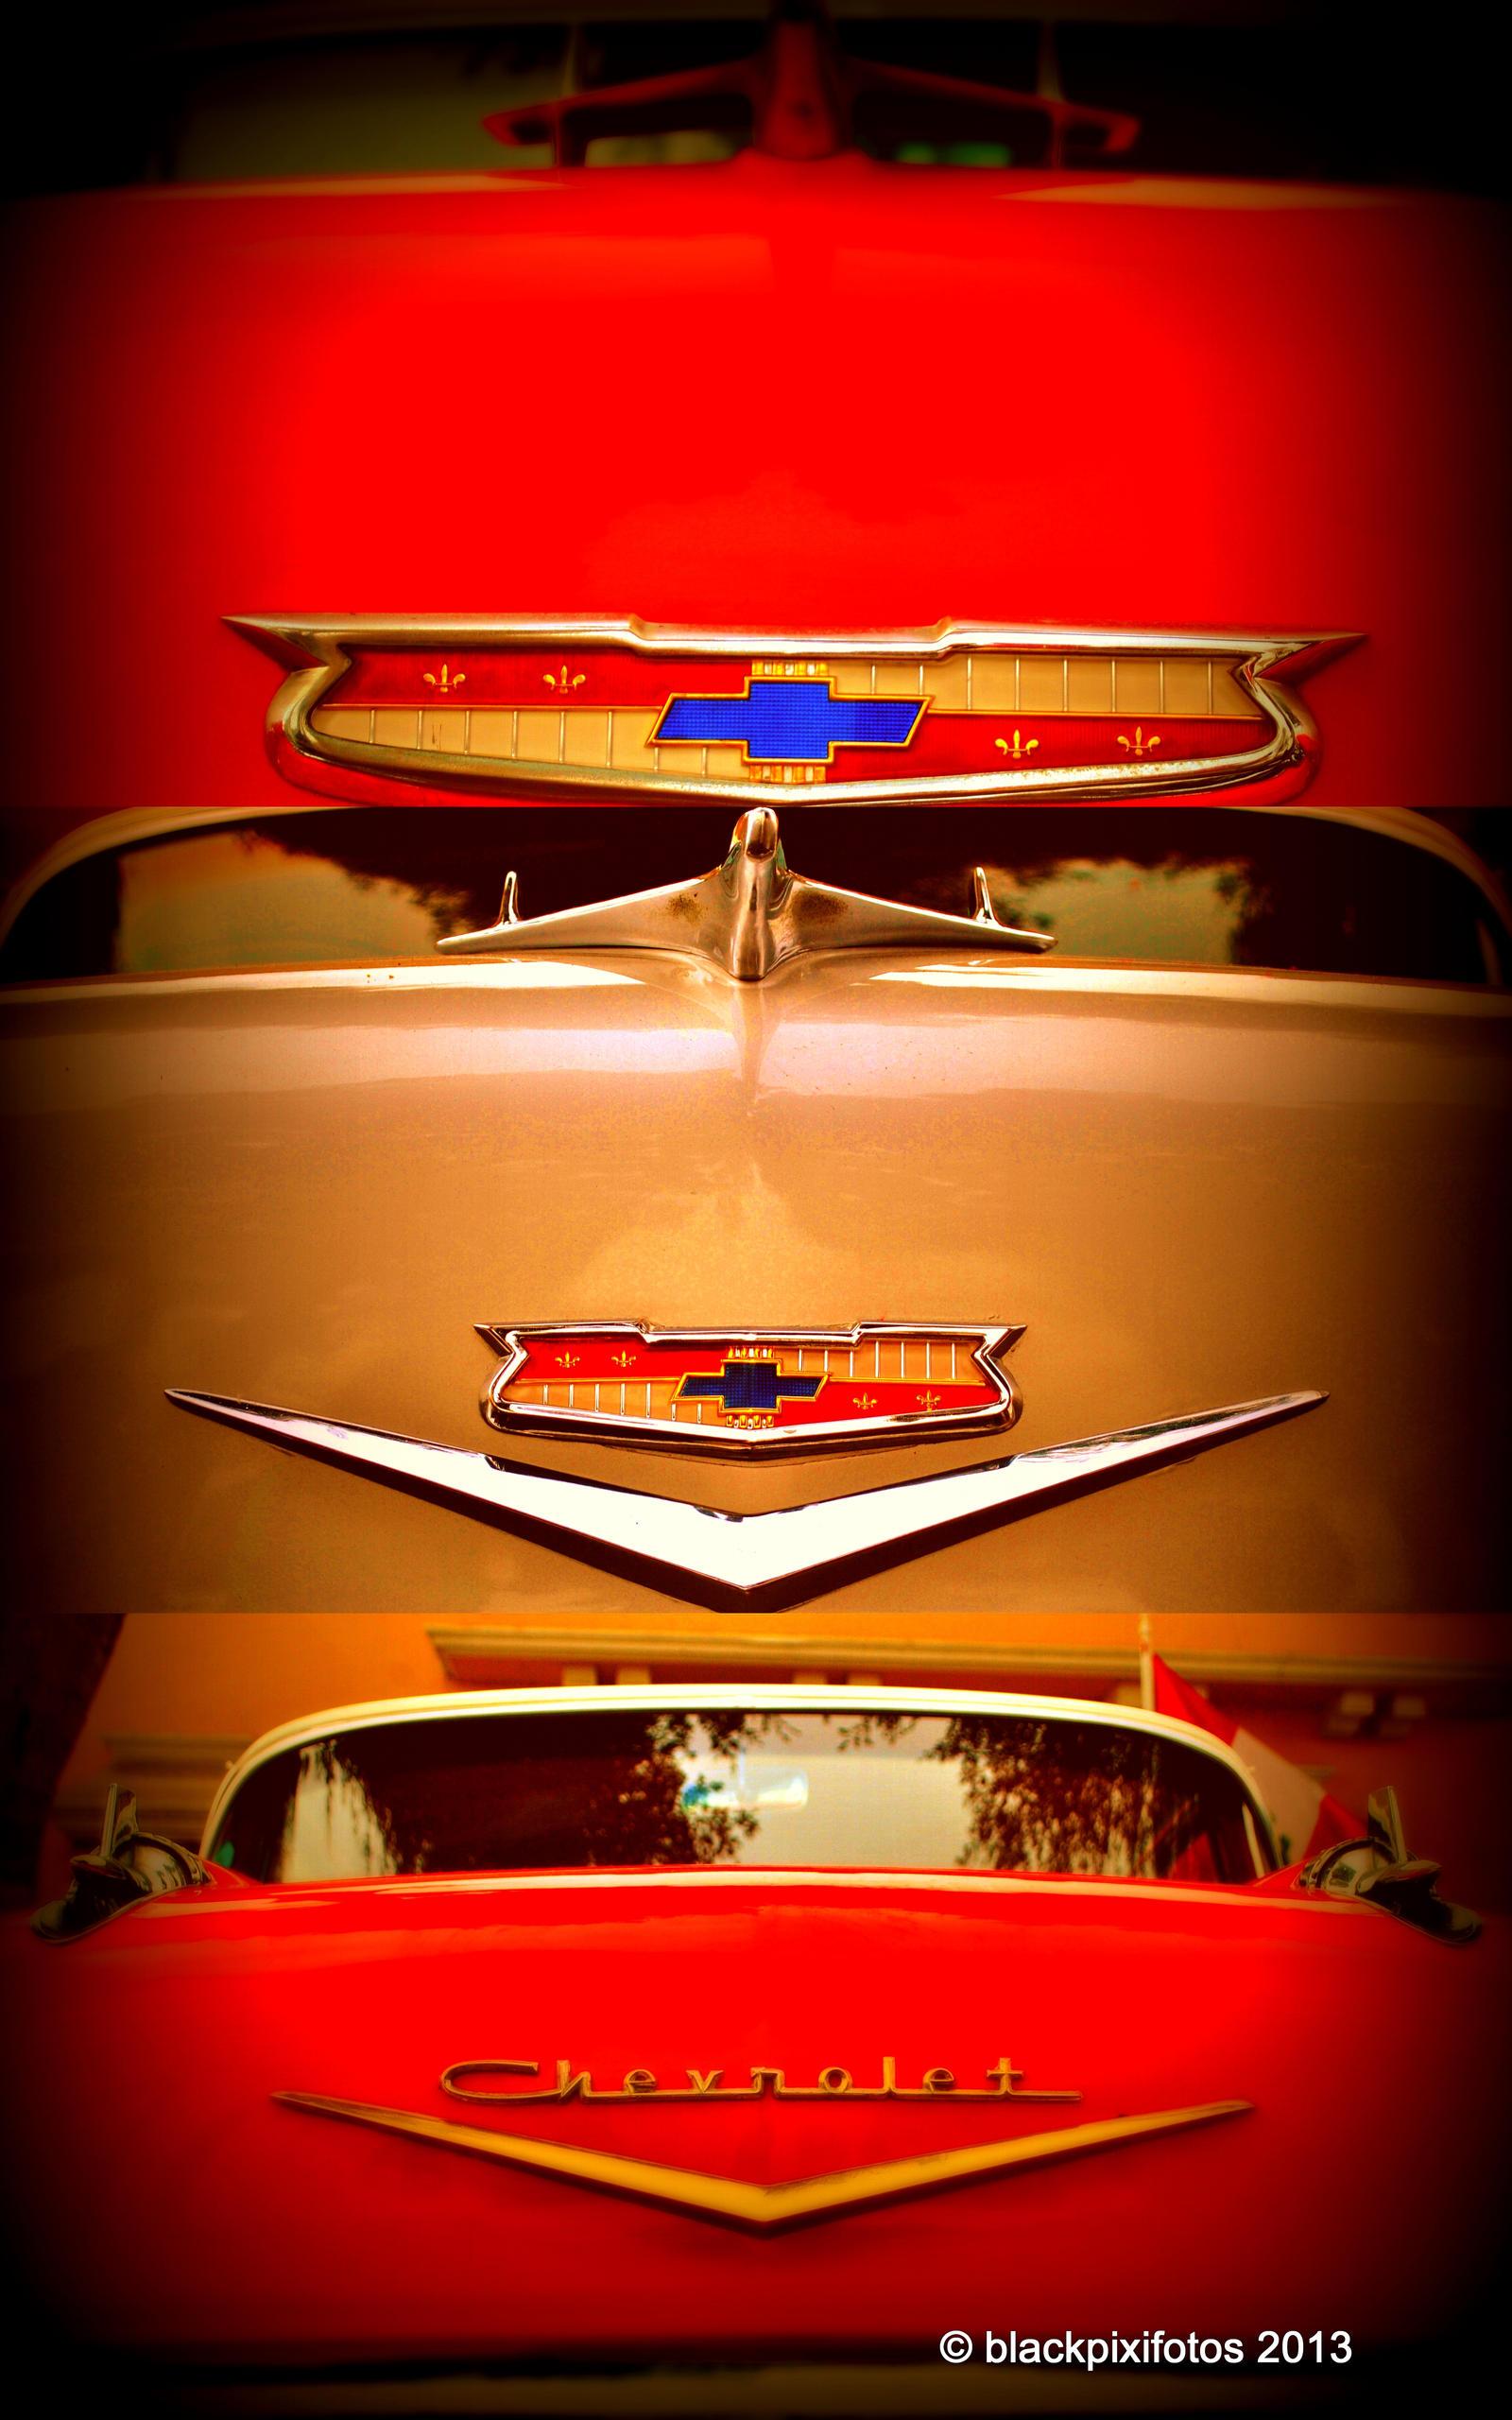 Chevy Emblems by blackpixifotos